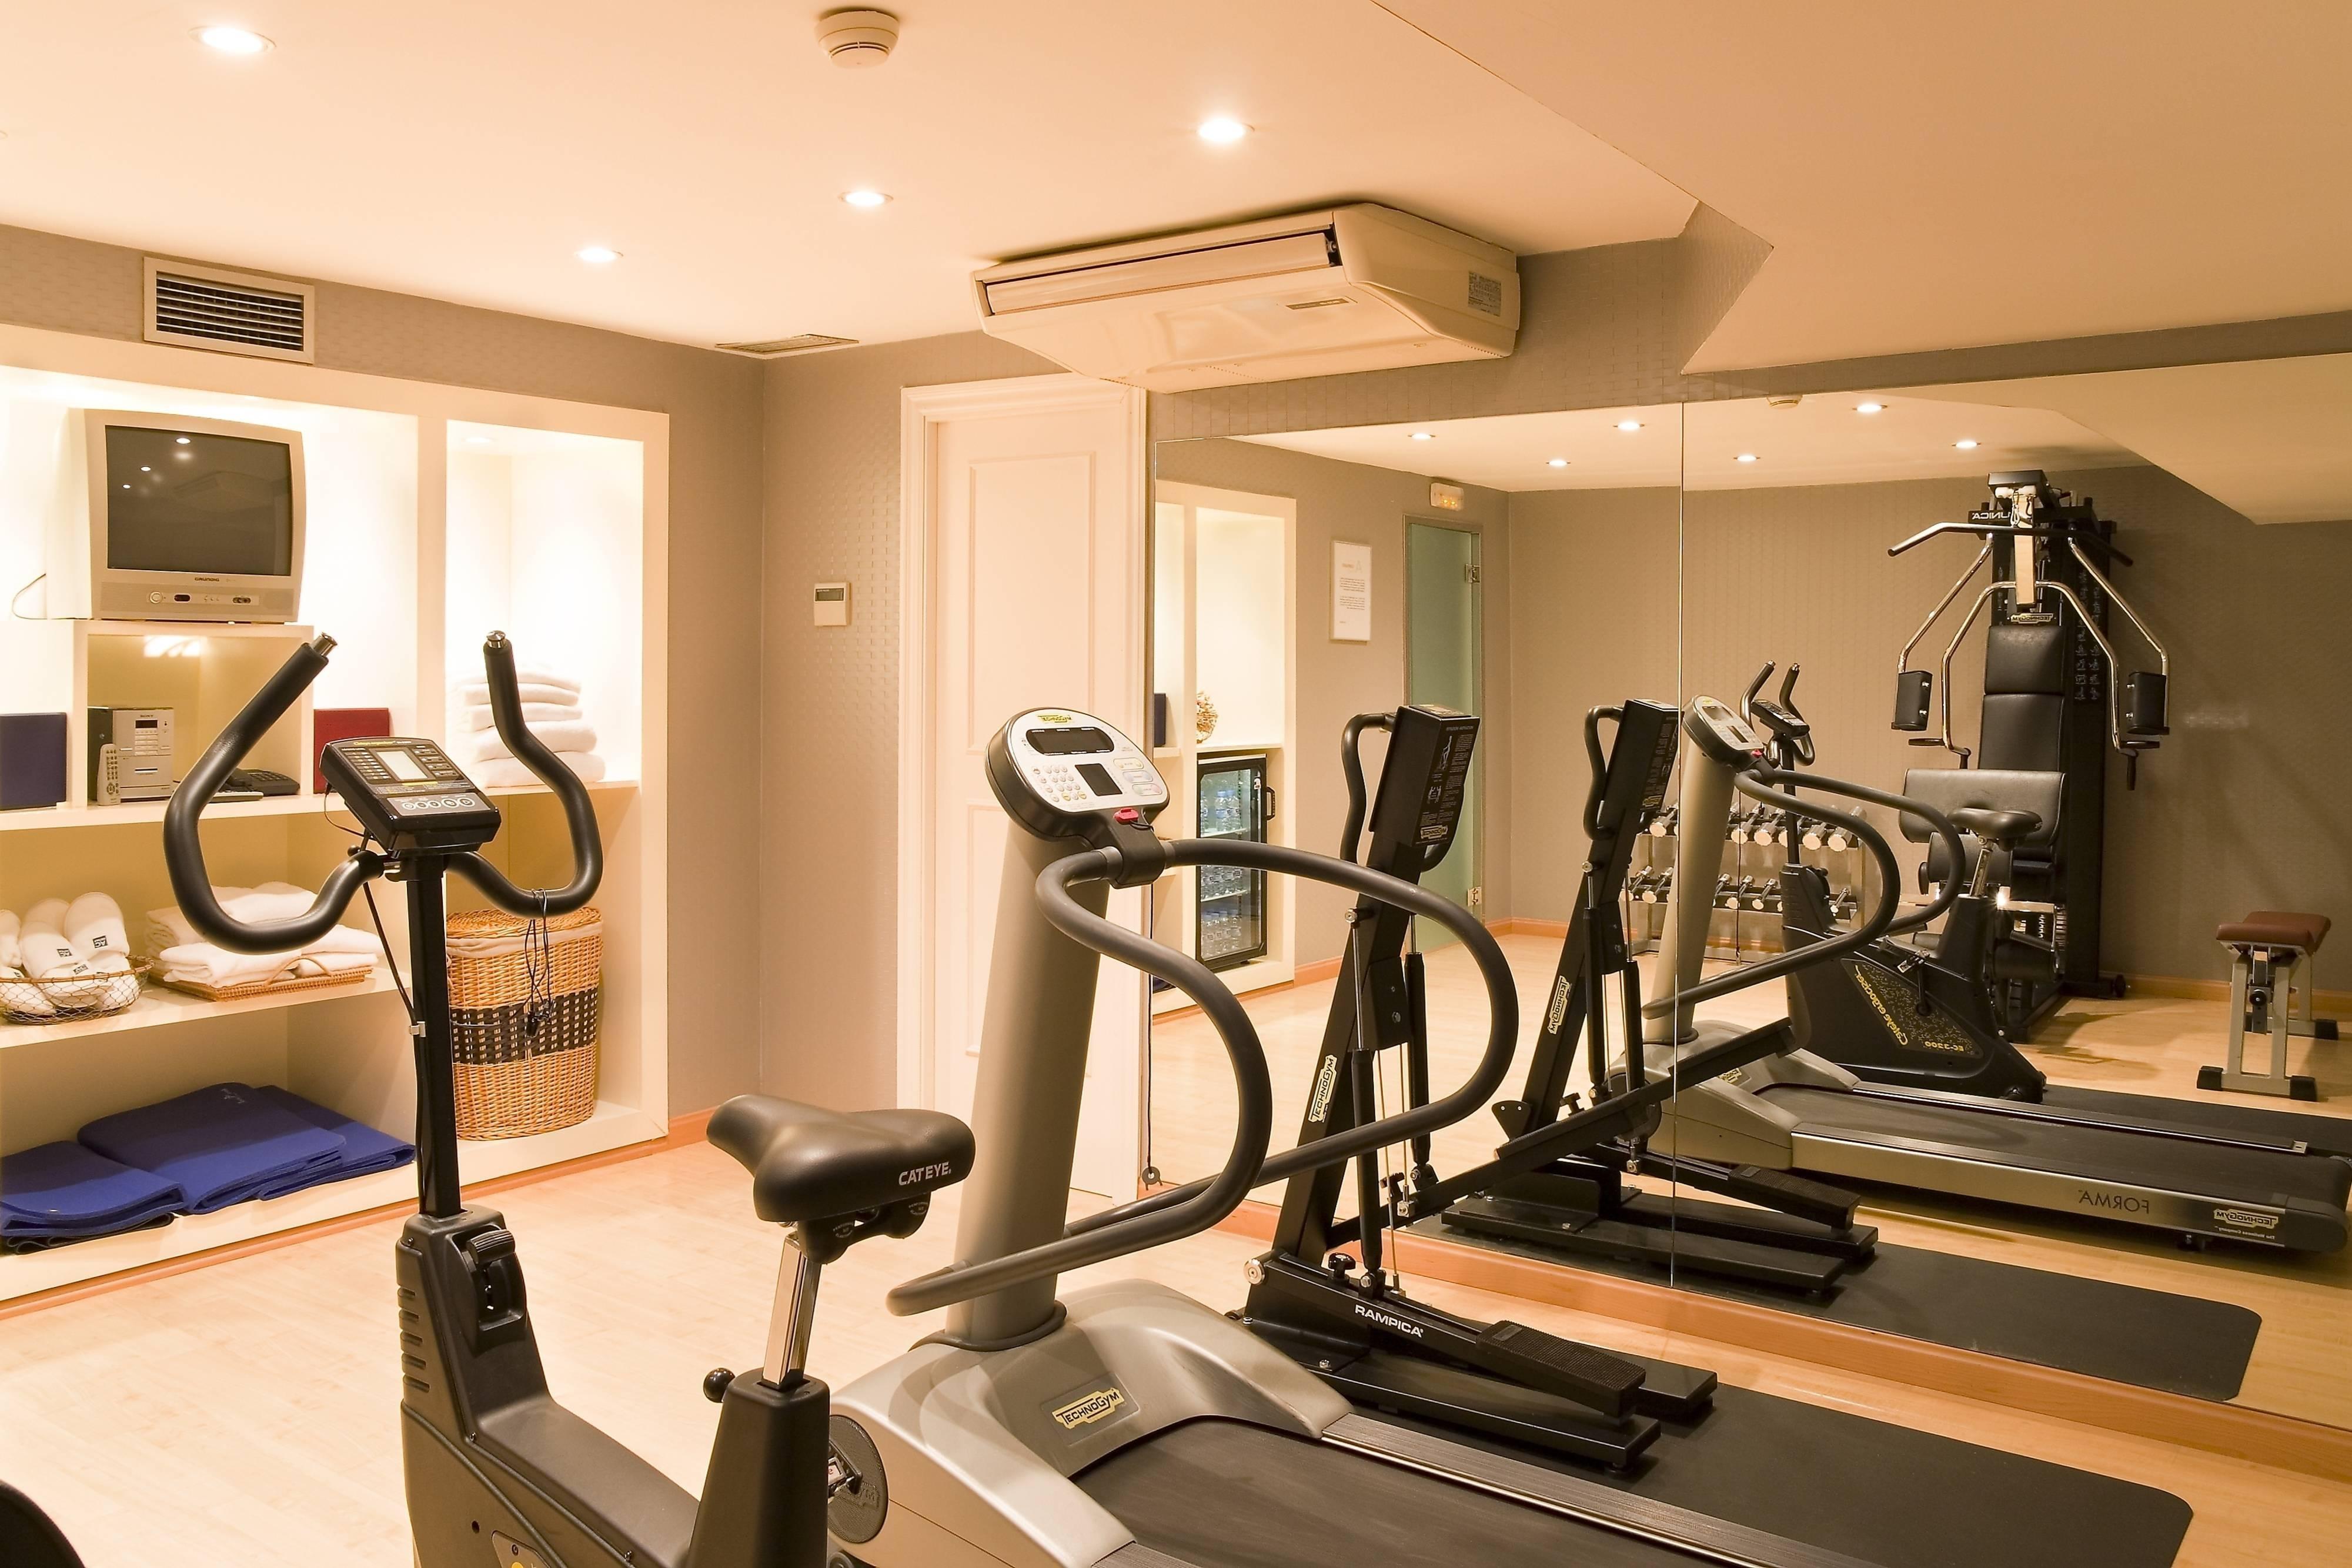 Toledo hotel fitness centre